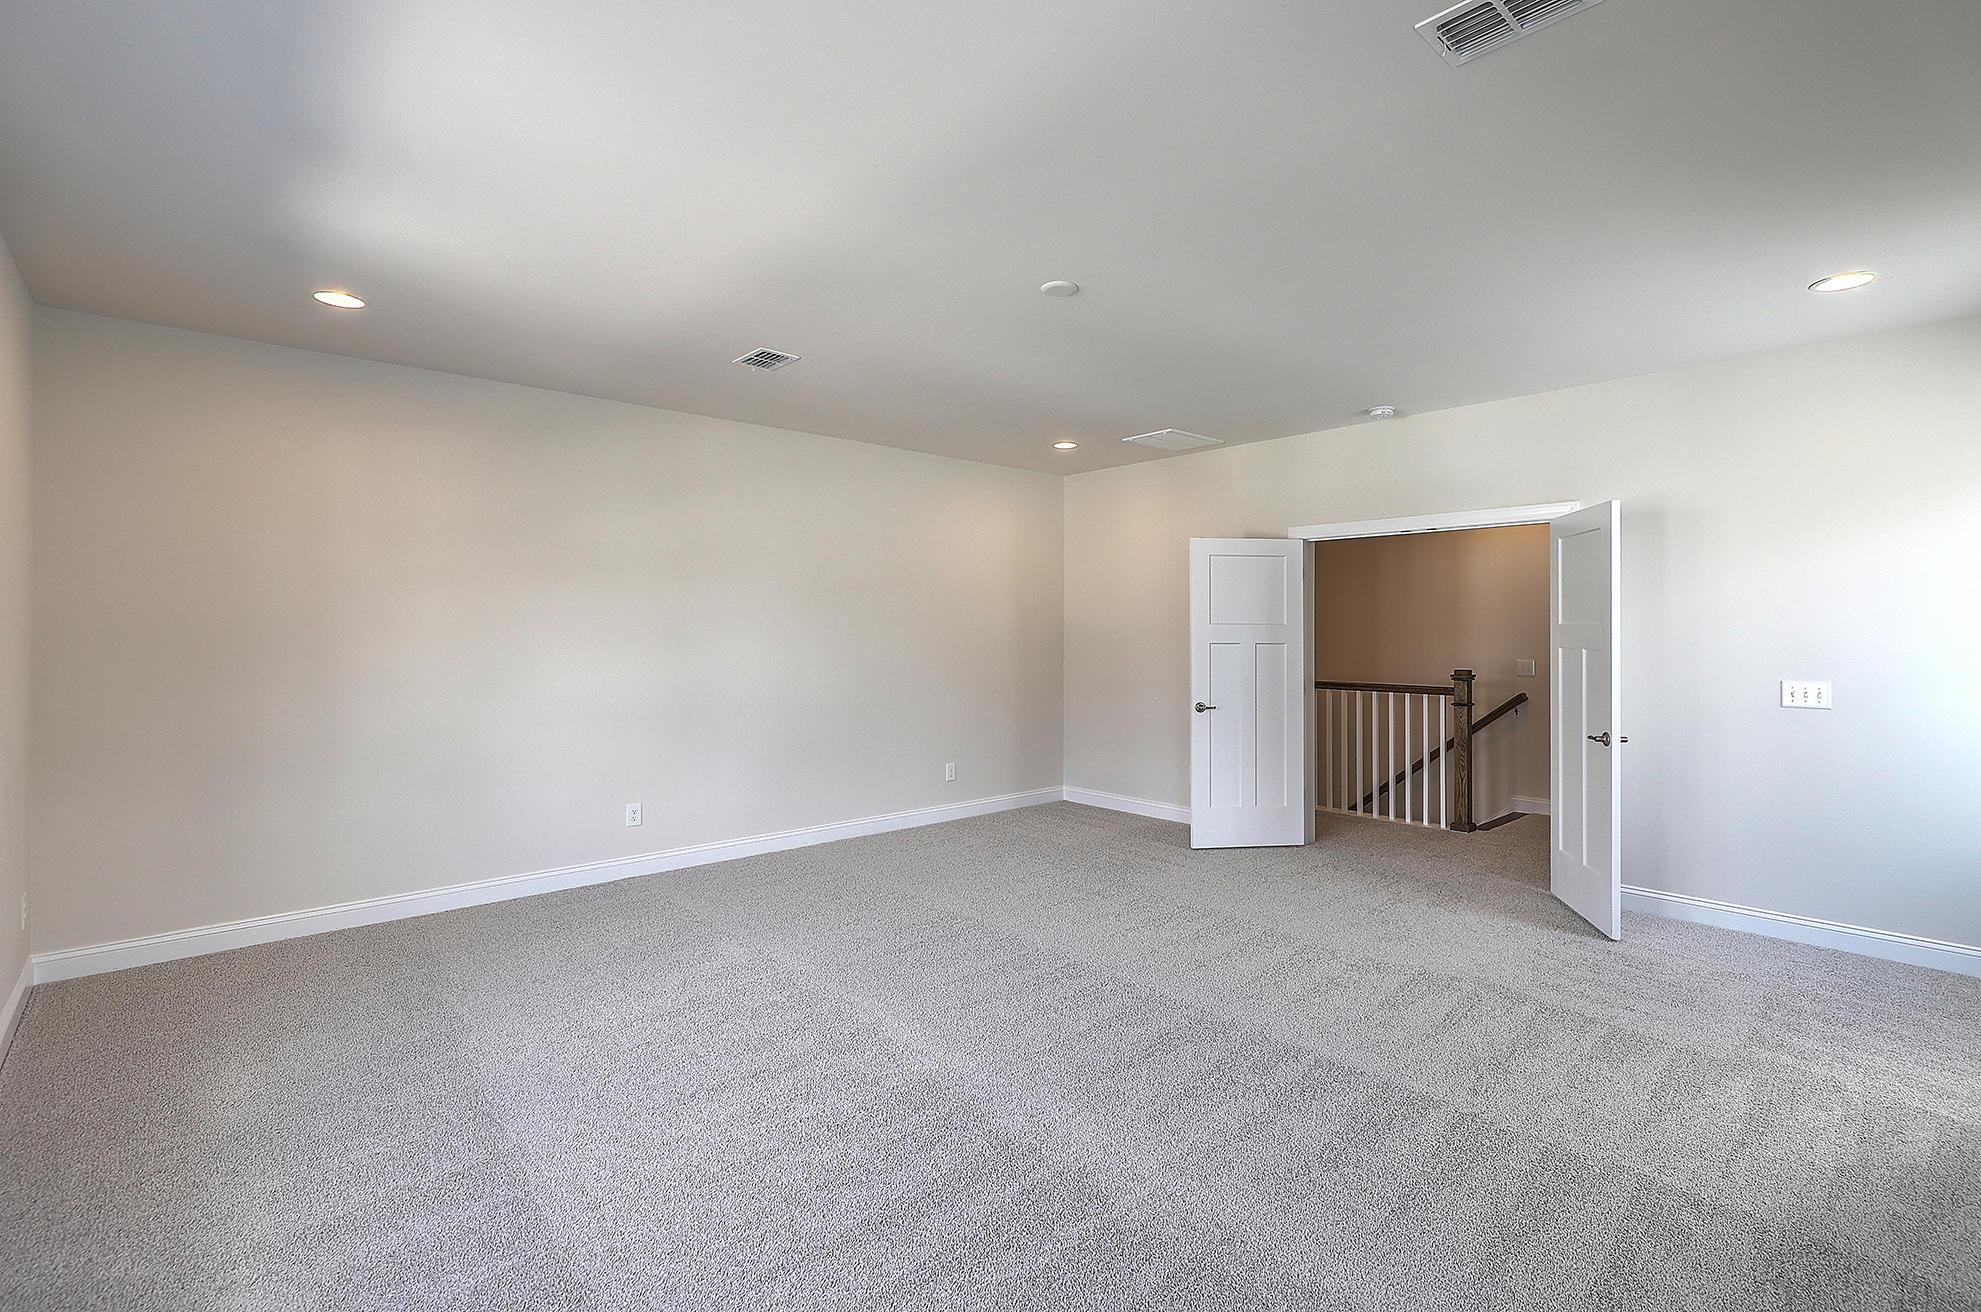 Bentley Park Homes For Sale - 1261 Gannett, Mount Pleasant, SC - 36